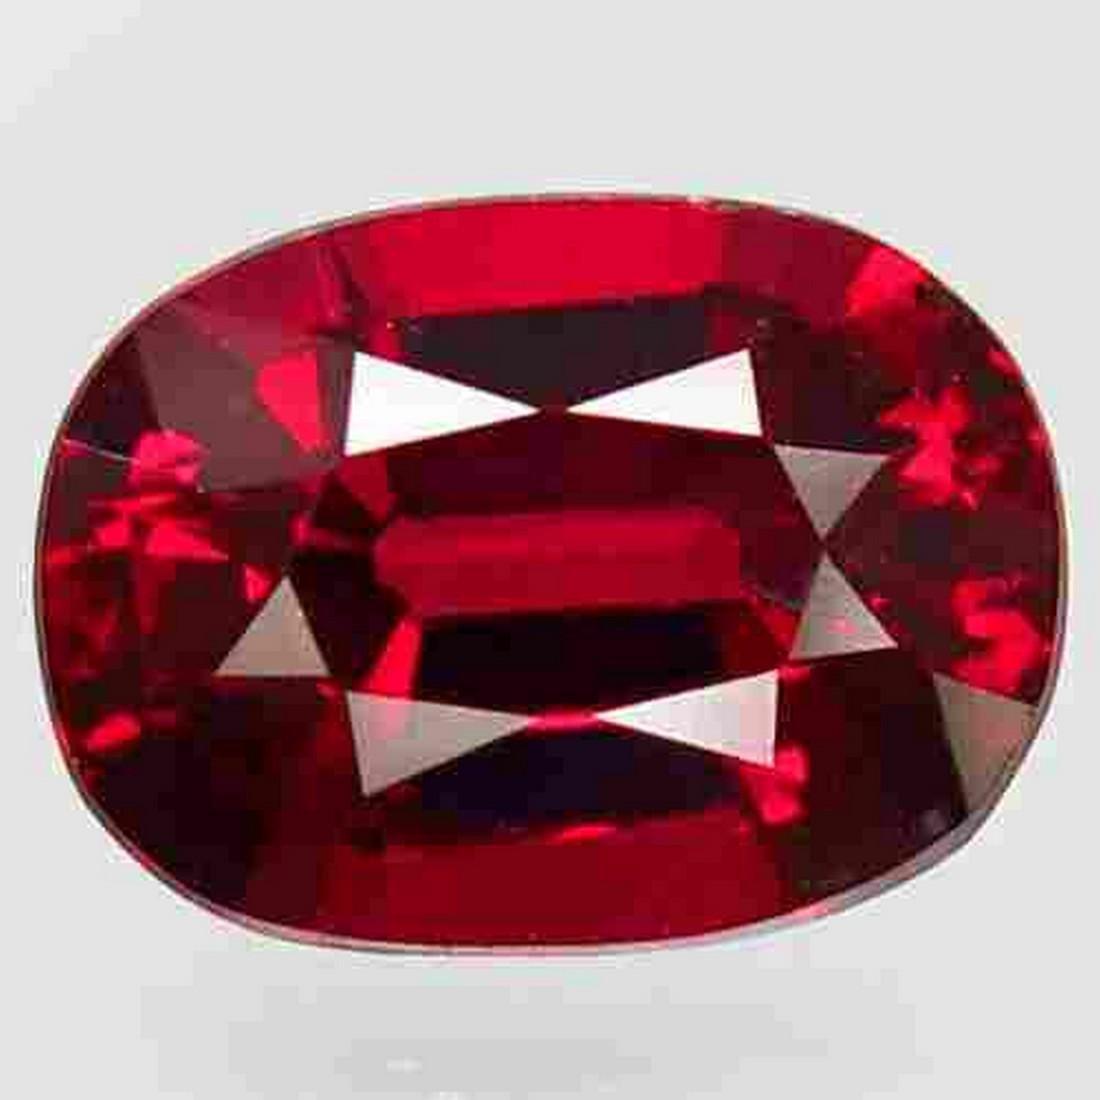 2.29 ct natural top red rhodolite garnet